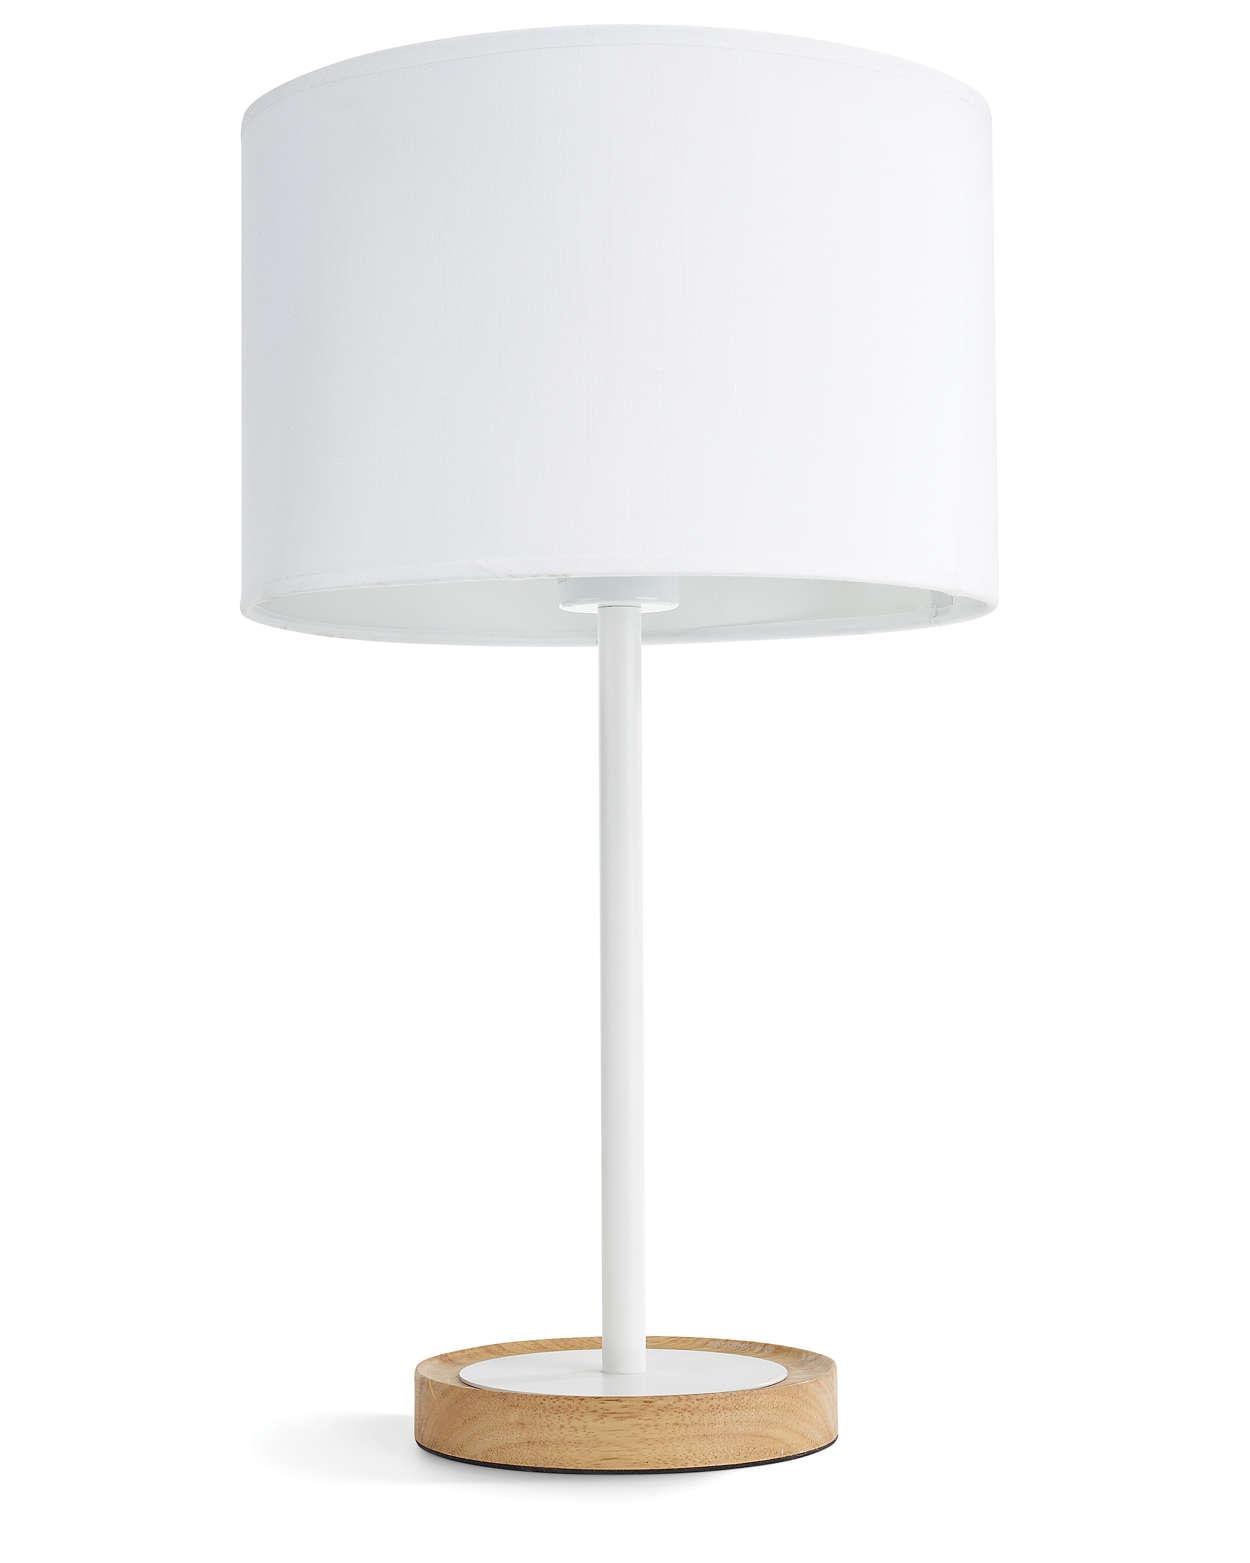 americana lamp lamparas lamps table distributor de catalogo miguel en carmemasia mil sobremesa